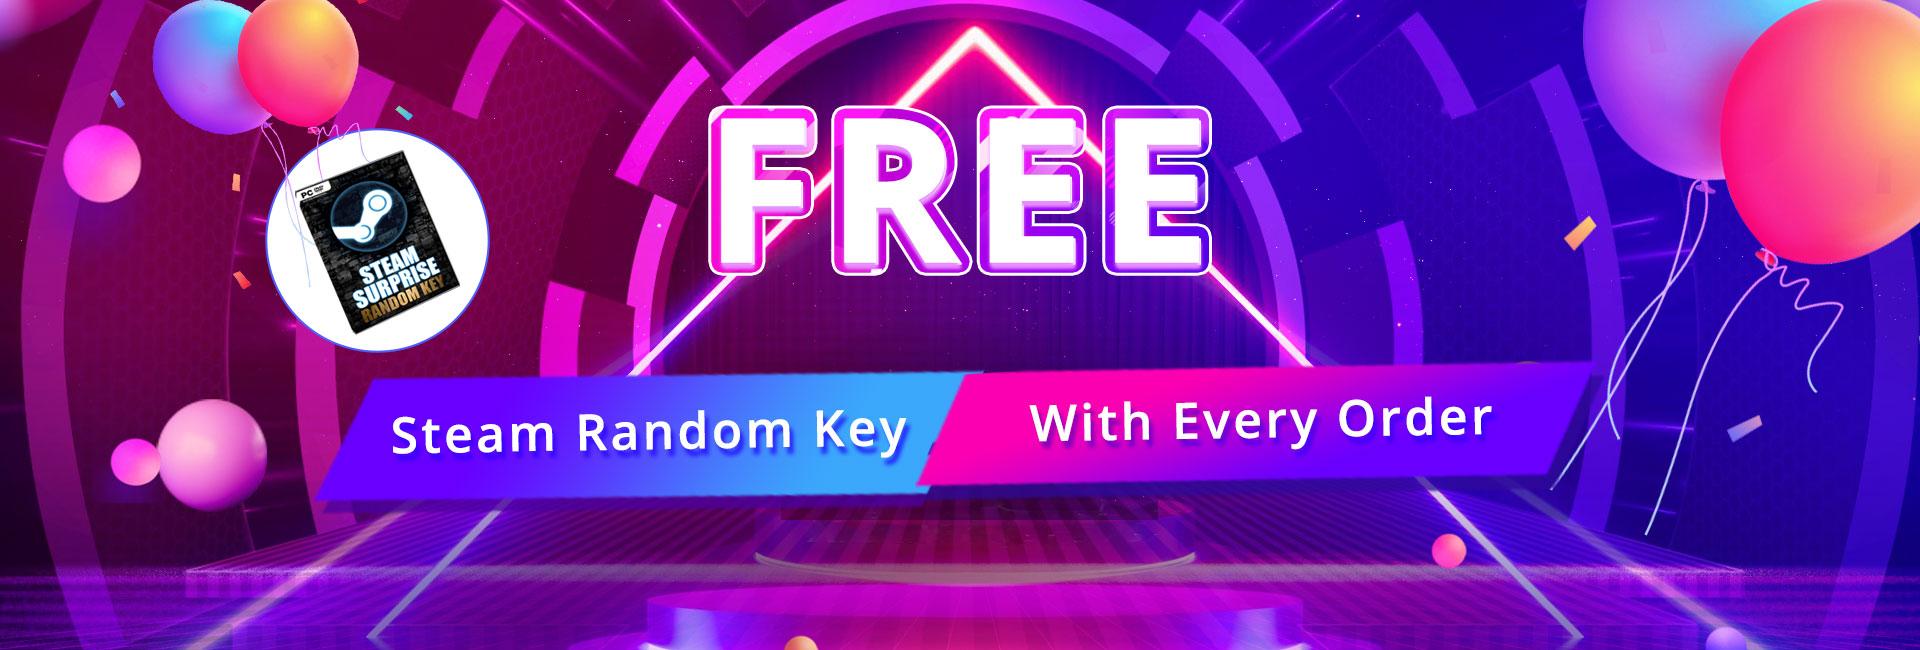 Free Steam Random Key with Every Order